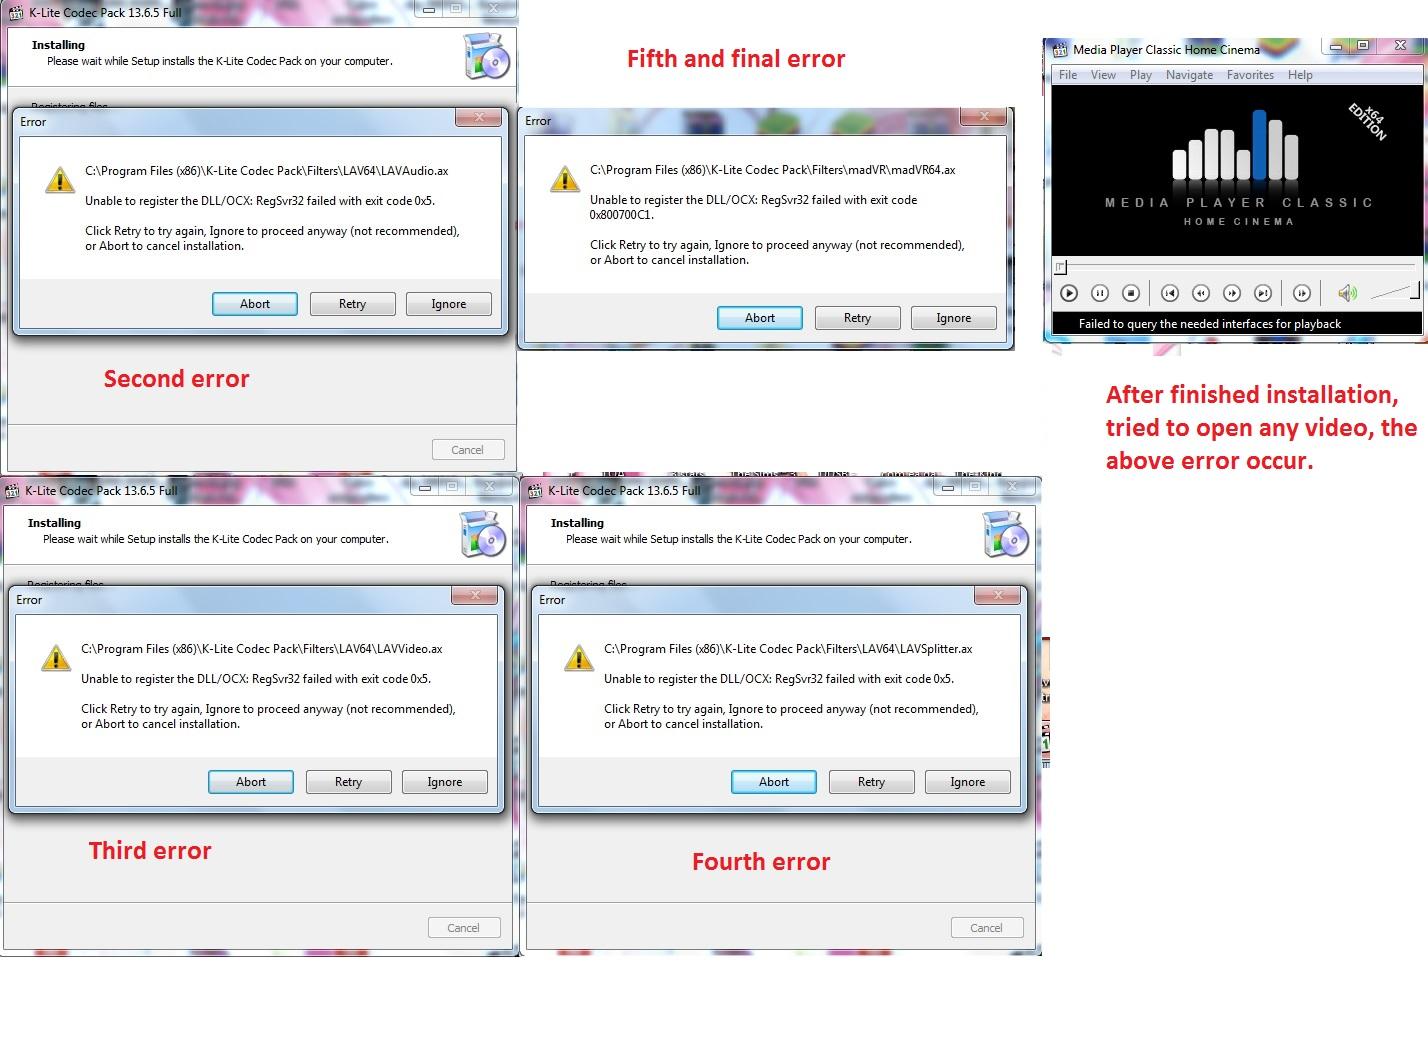 "Installation error ""Unable to register the DLL/OCX:RegSvr32 failed with exit code 0x5 Eredzt"